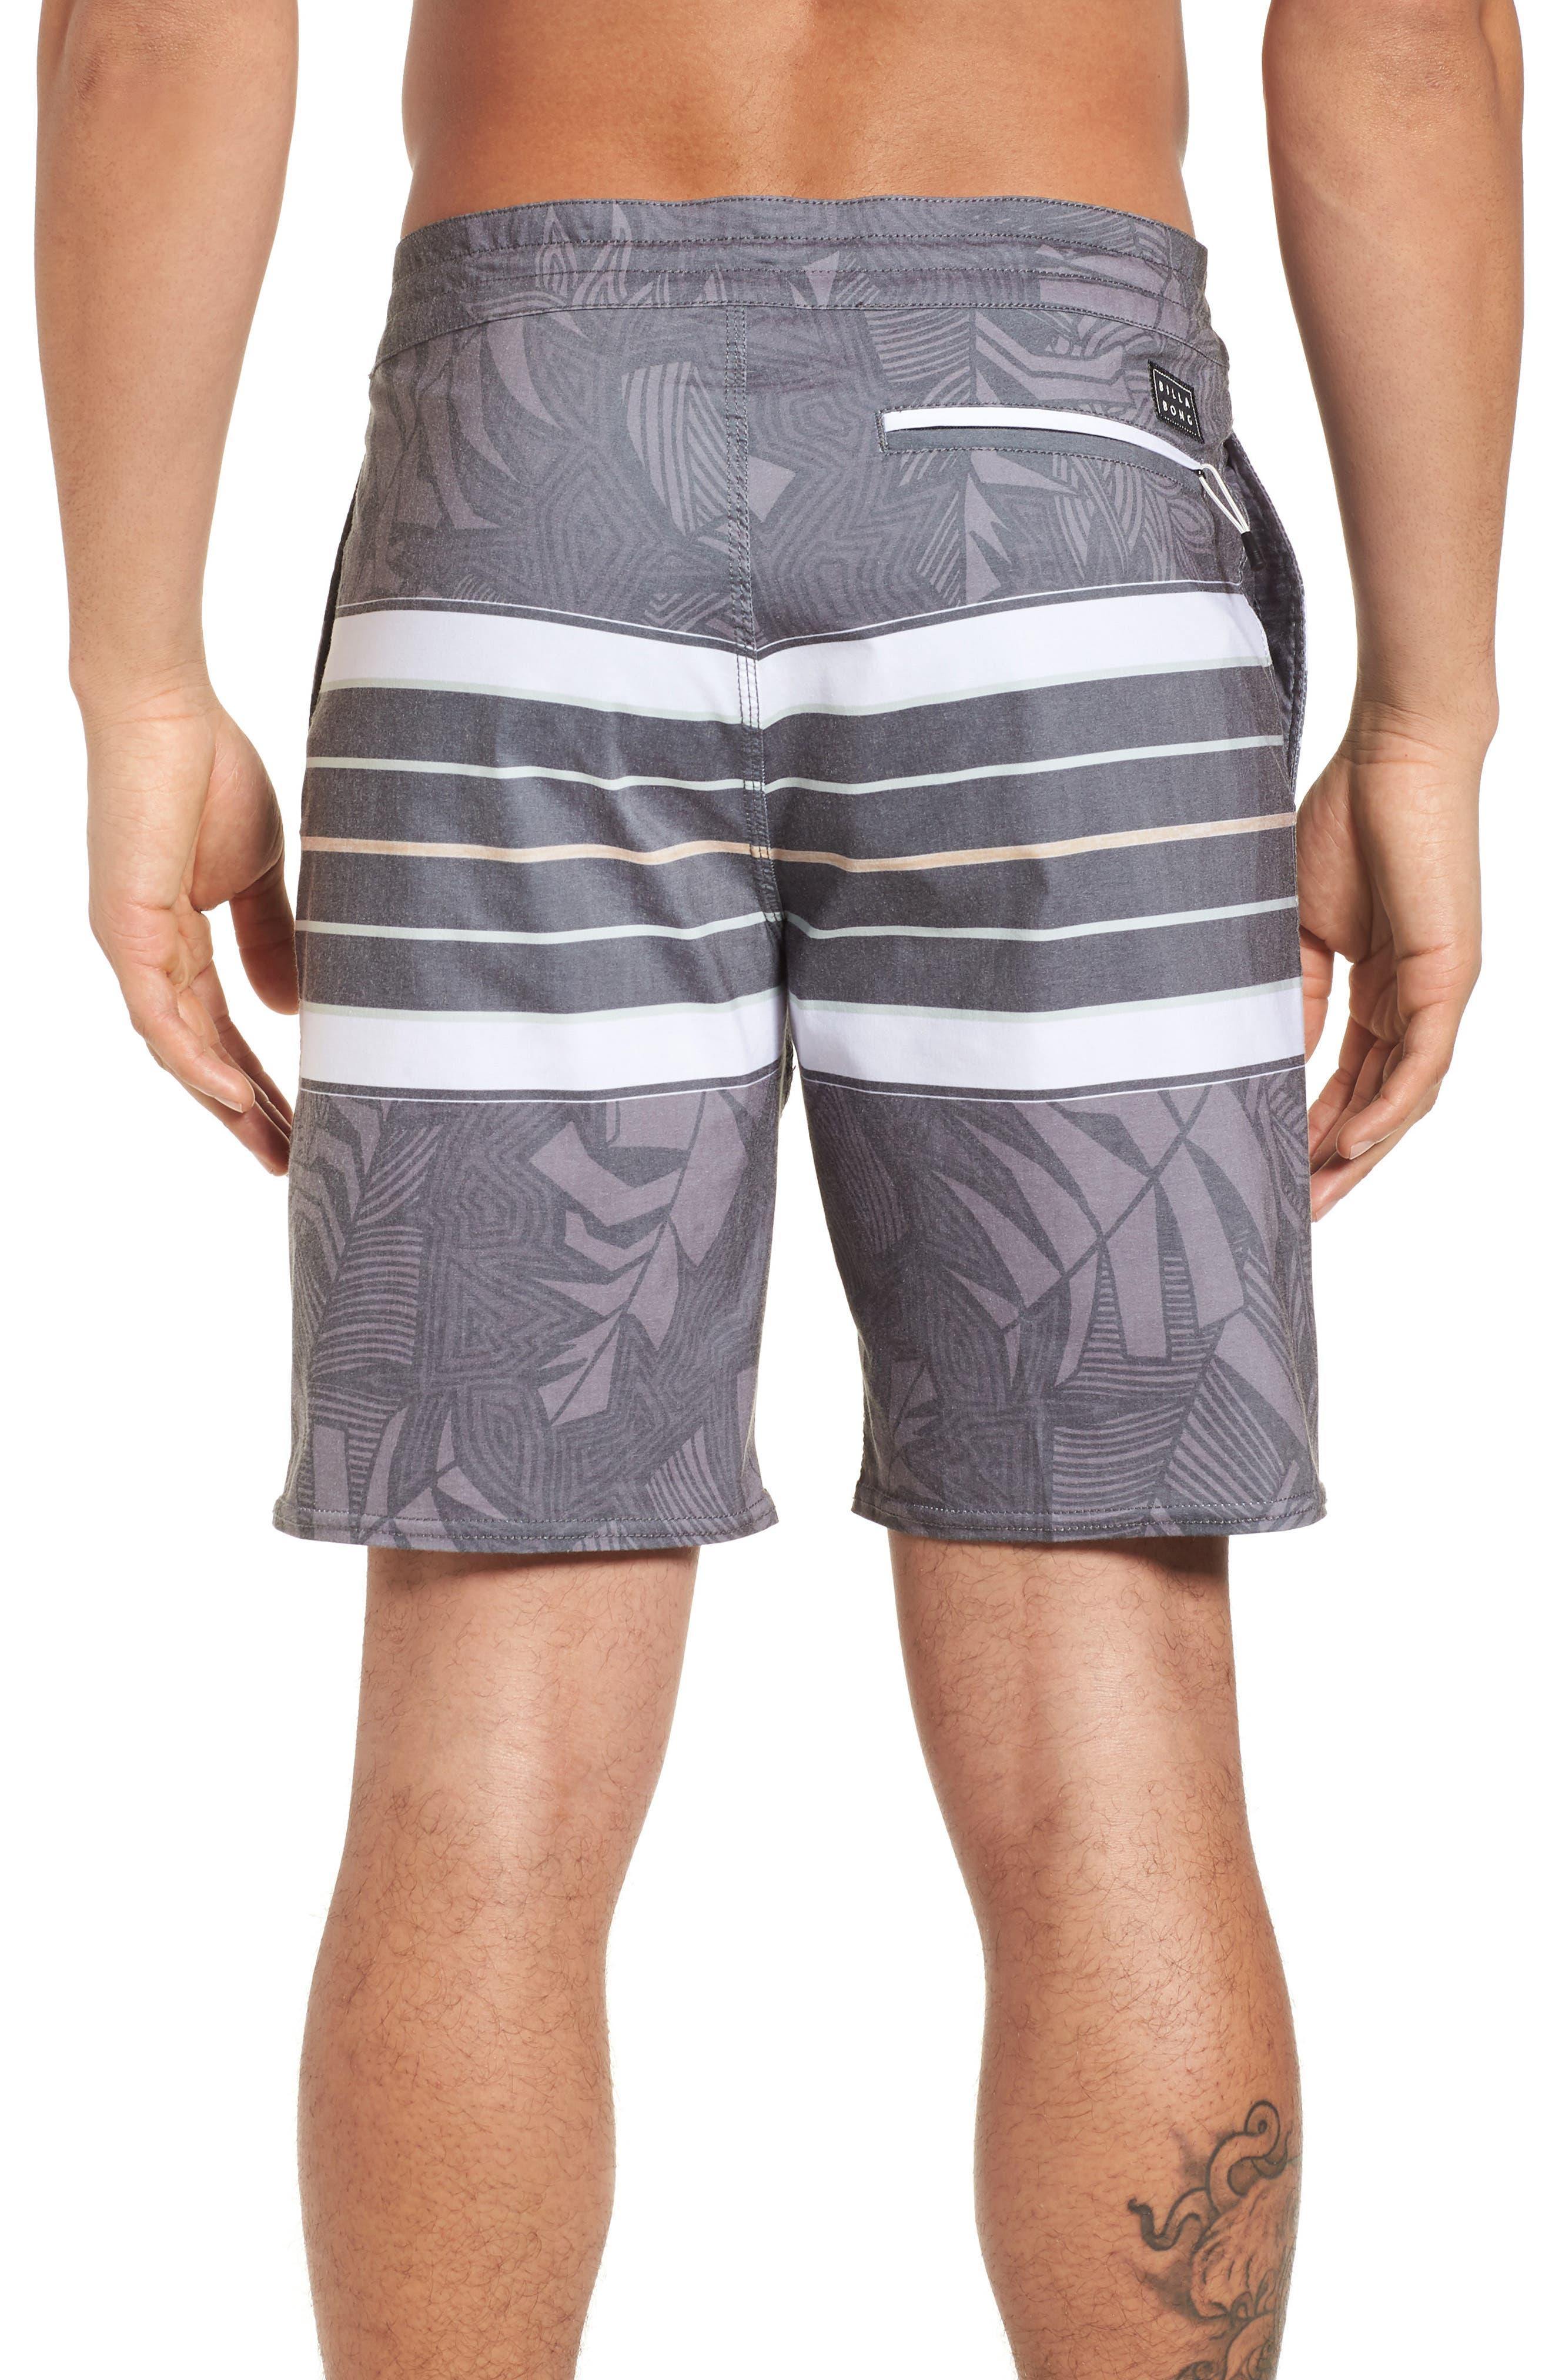 Stringer Lo Tides Board Shorts,                             Alternate thumbnail 2, color,                             001